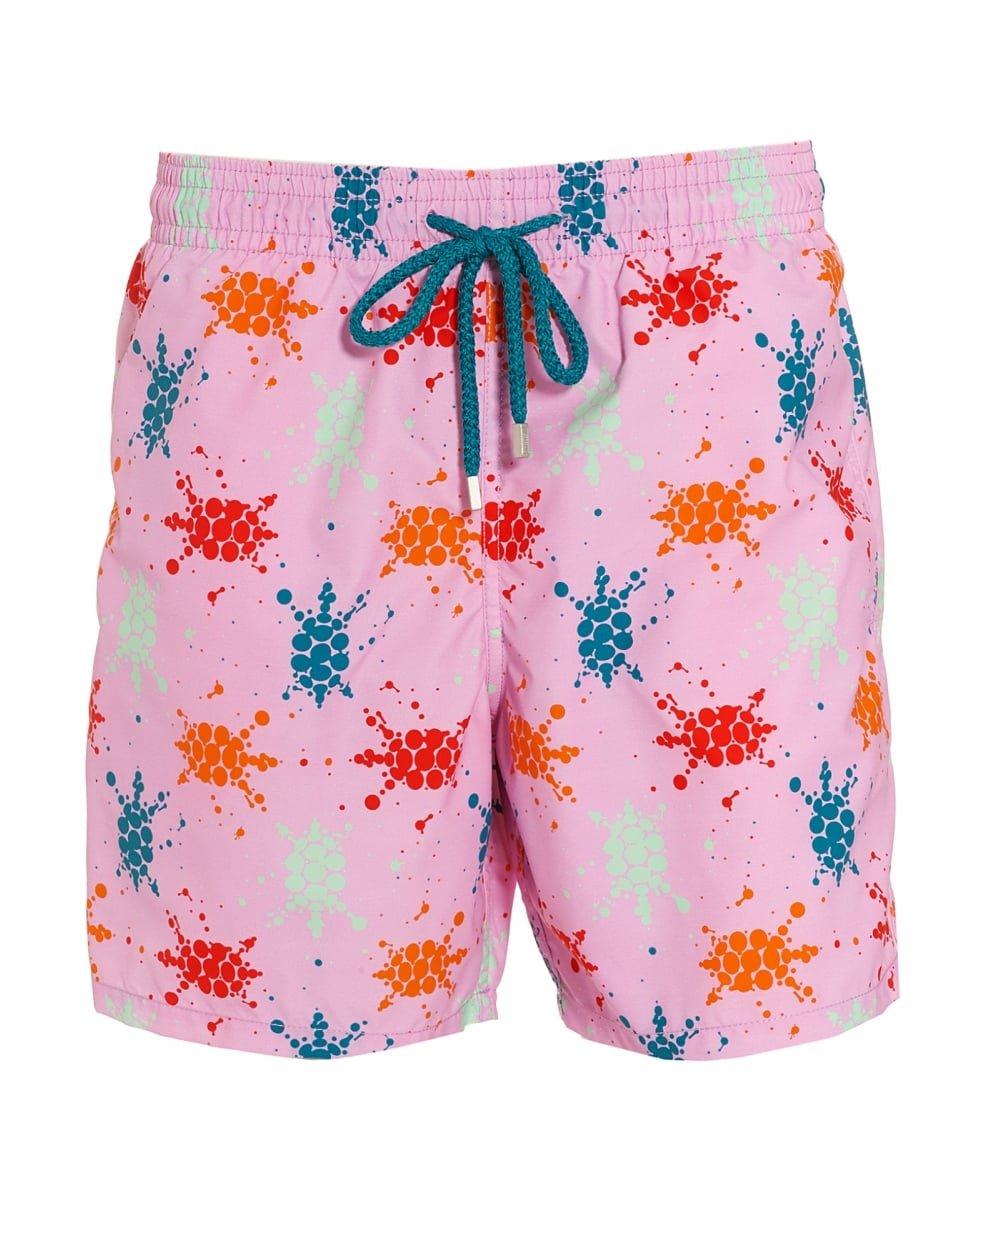 Vilebrequin - Japan Turtles Moorea Swimwear - Men - XXL - Rose Quartz by Vilebrequin (Image #1)